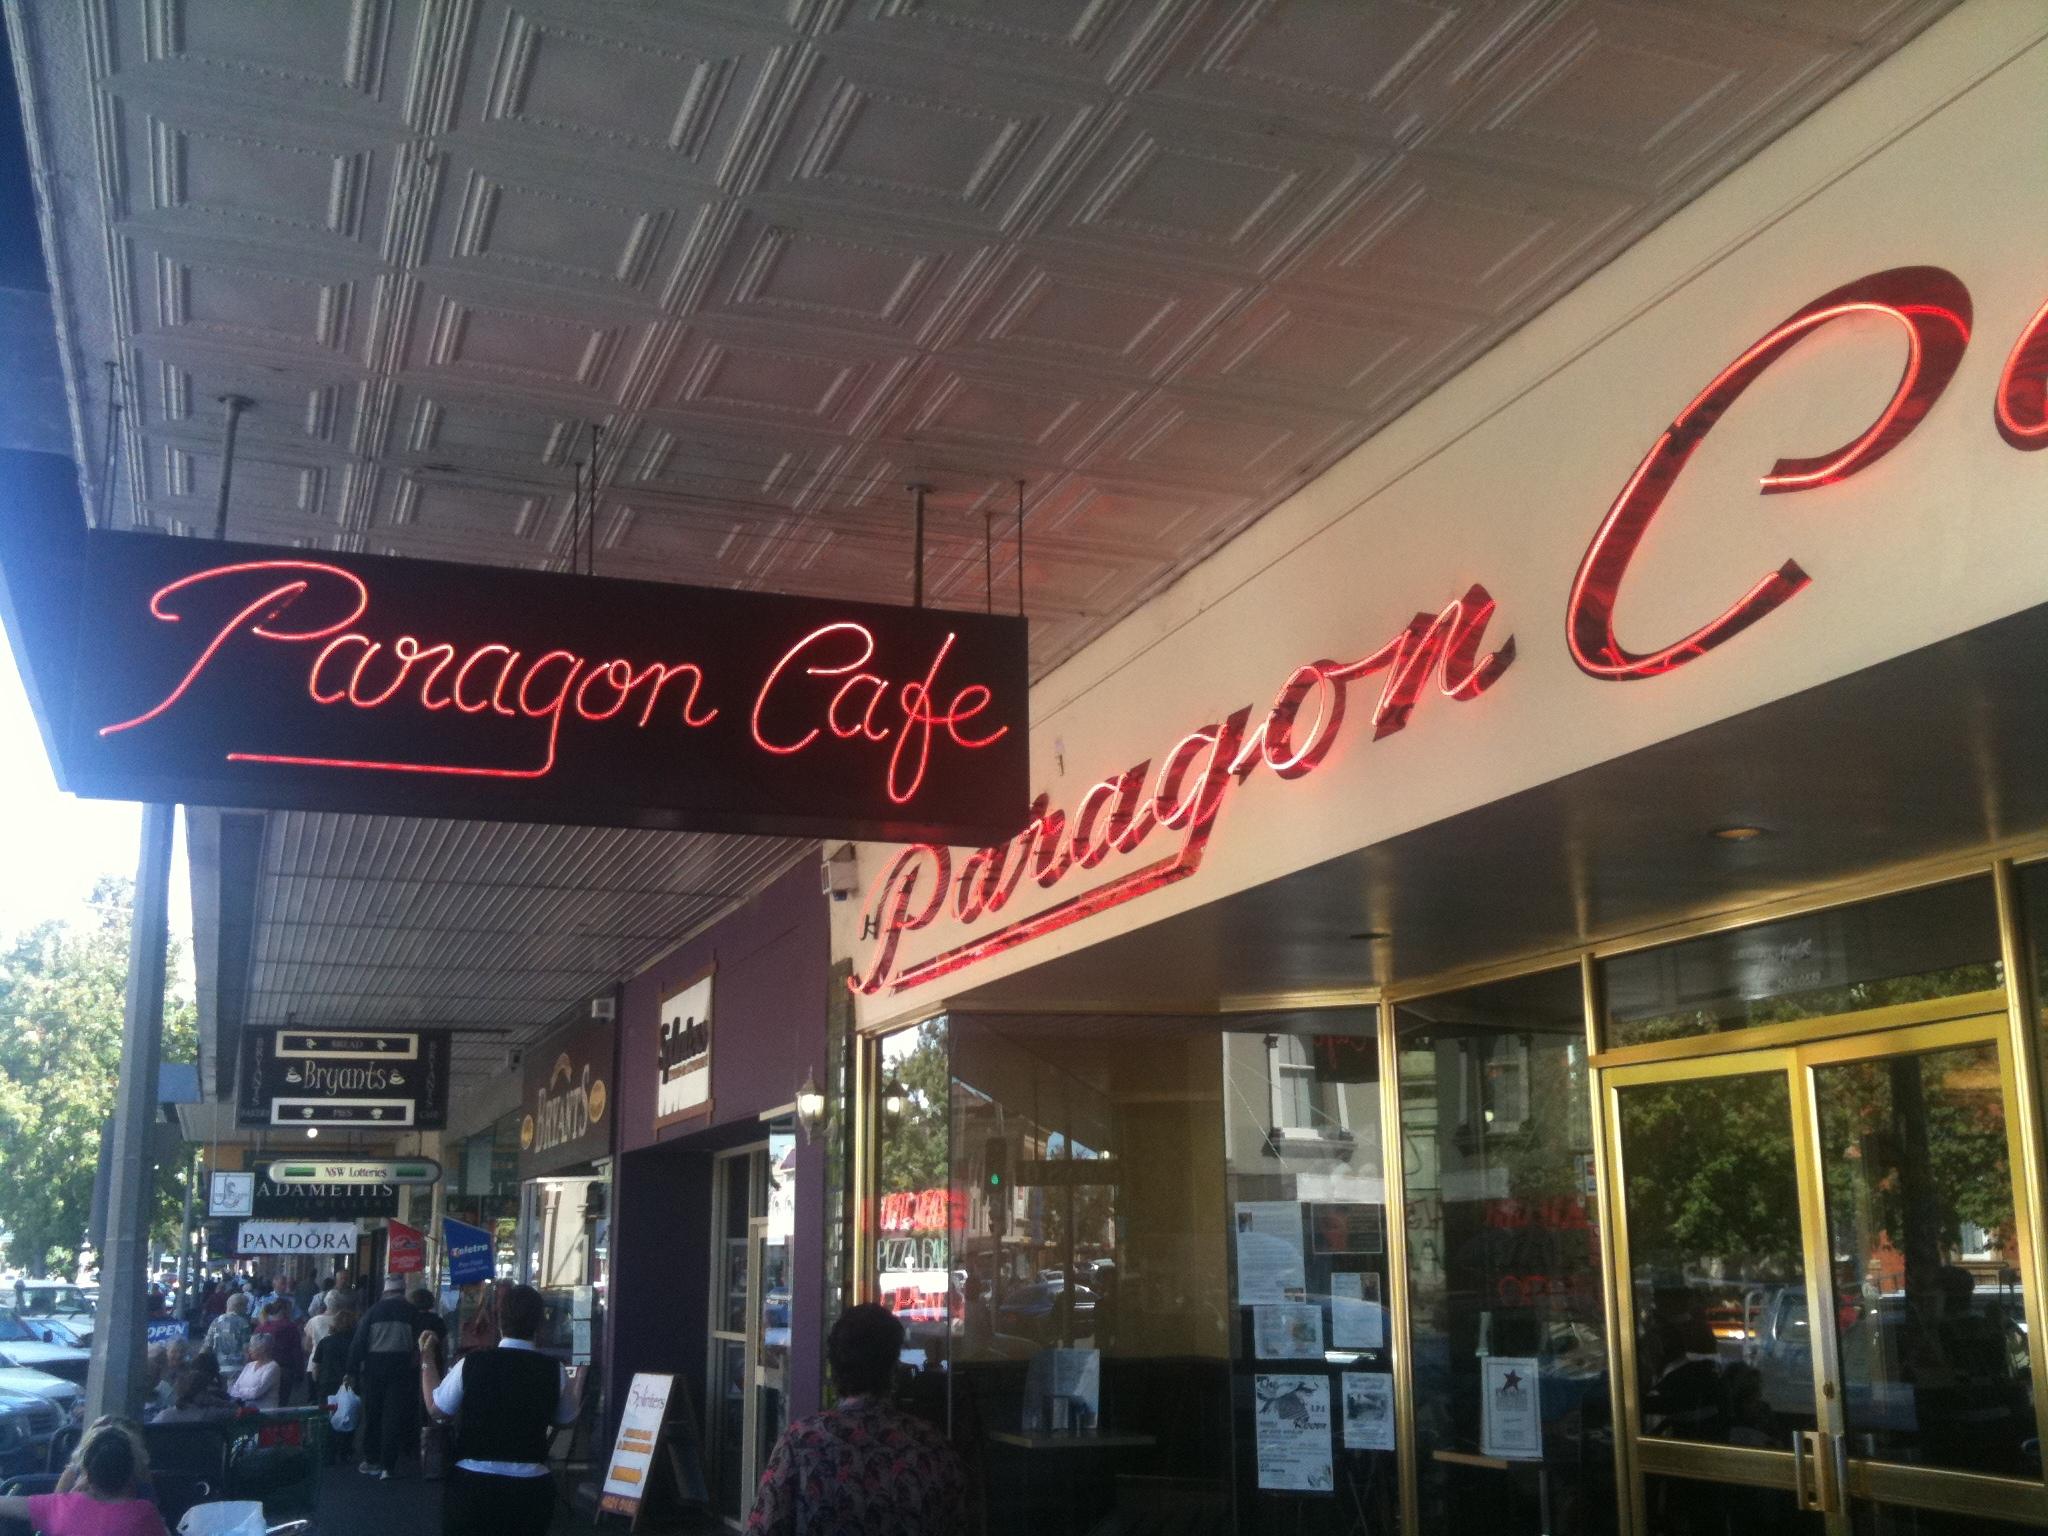 Paragon Cafe Goulburn Breakfast Menu